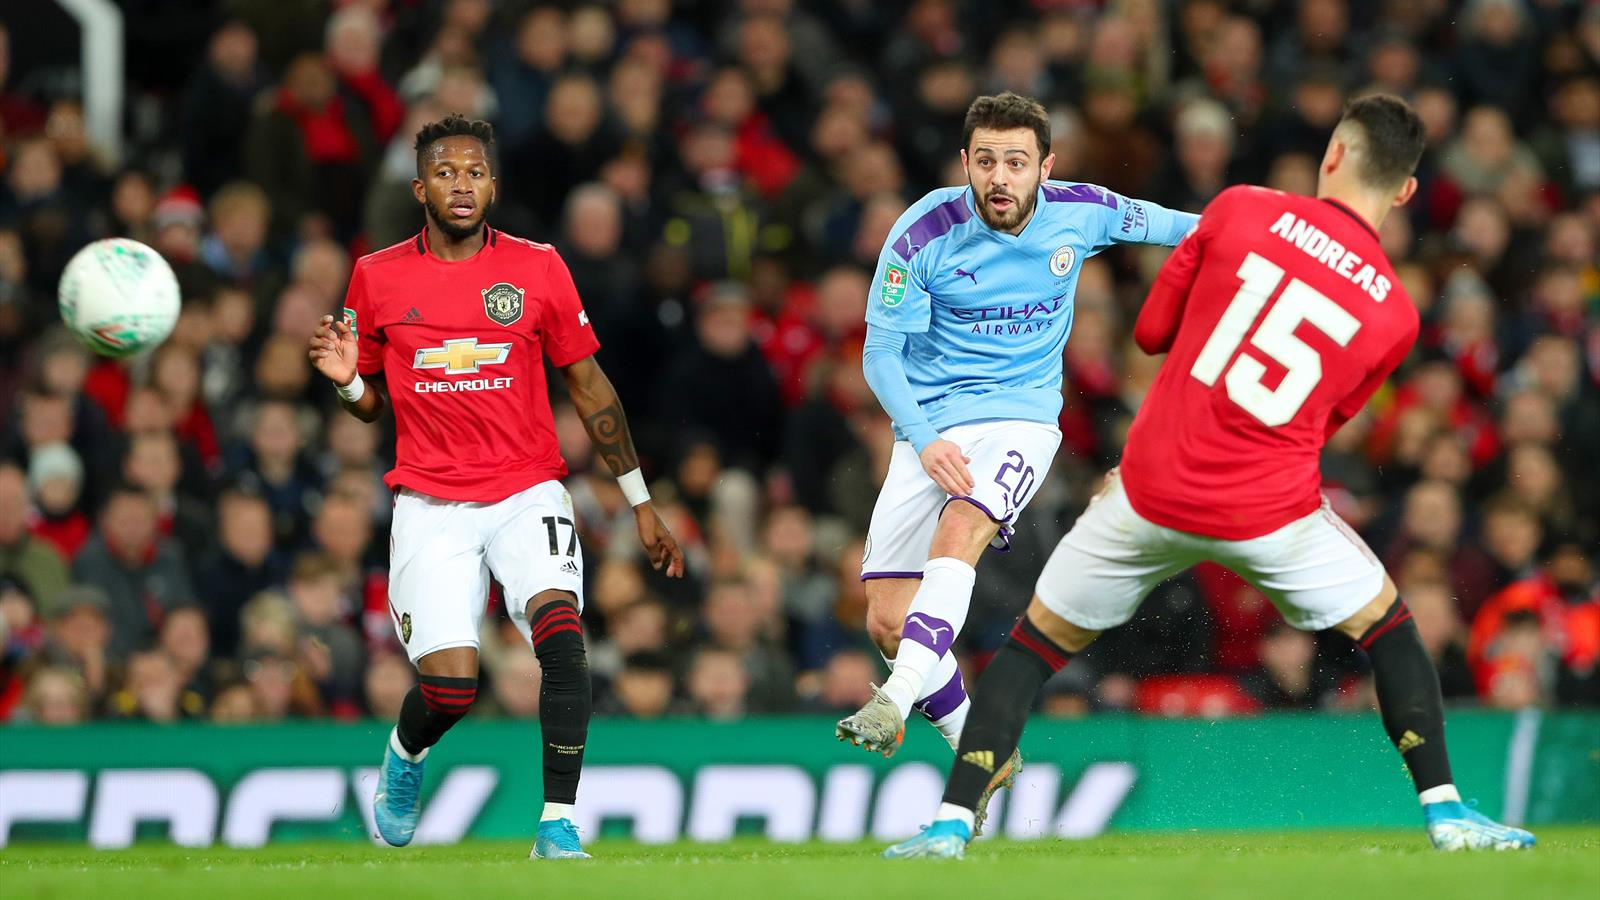 Манчестер юнайтед против атлетик б. видео матча